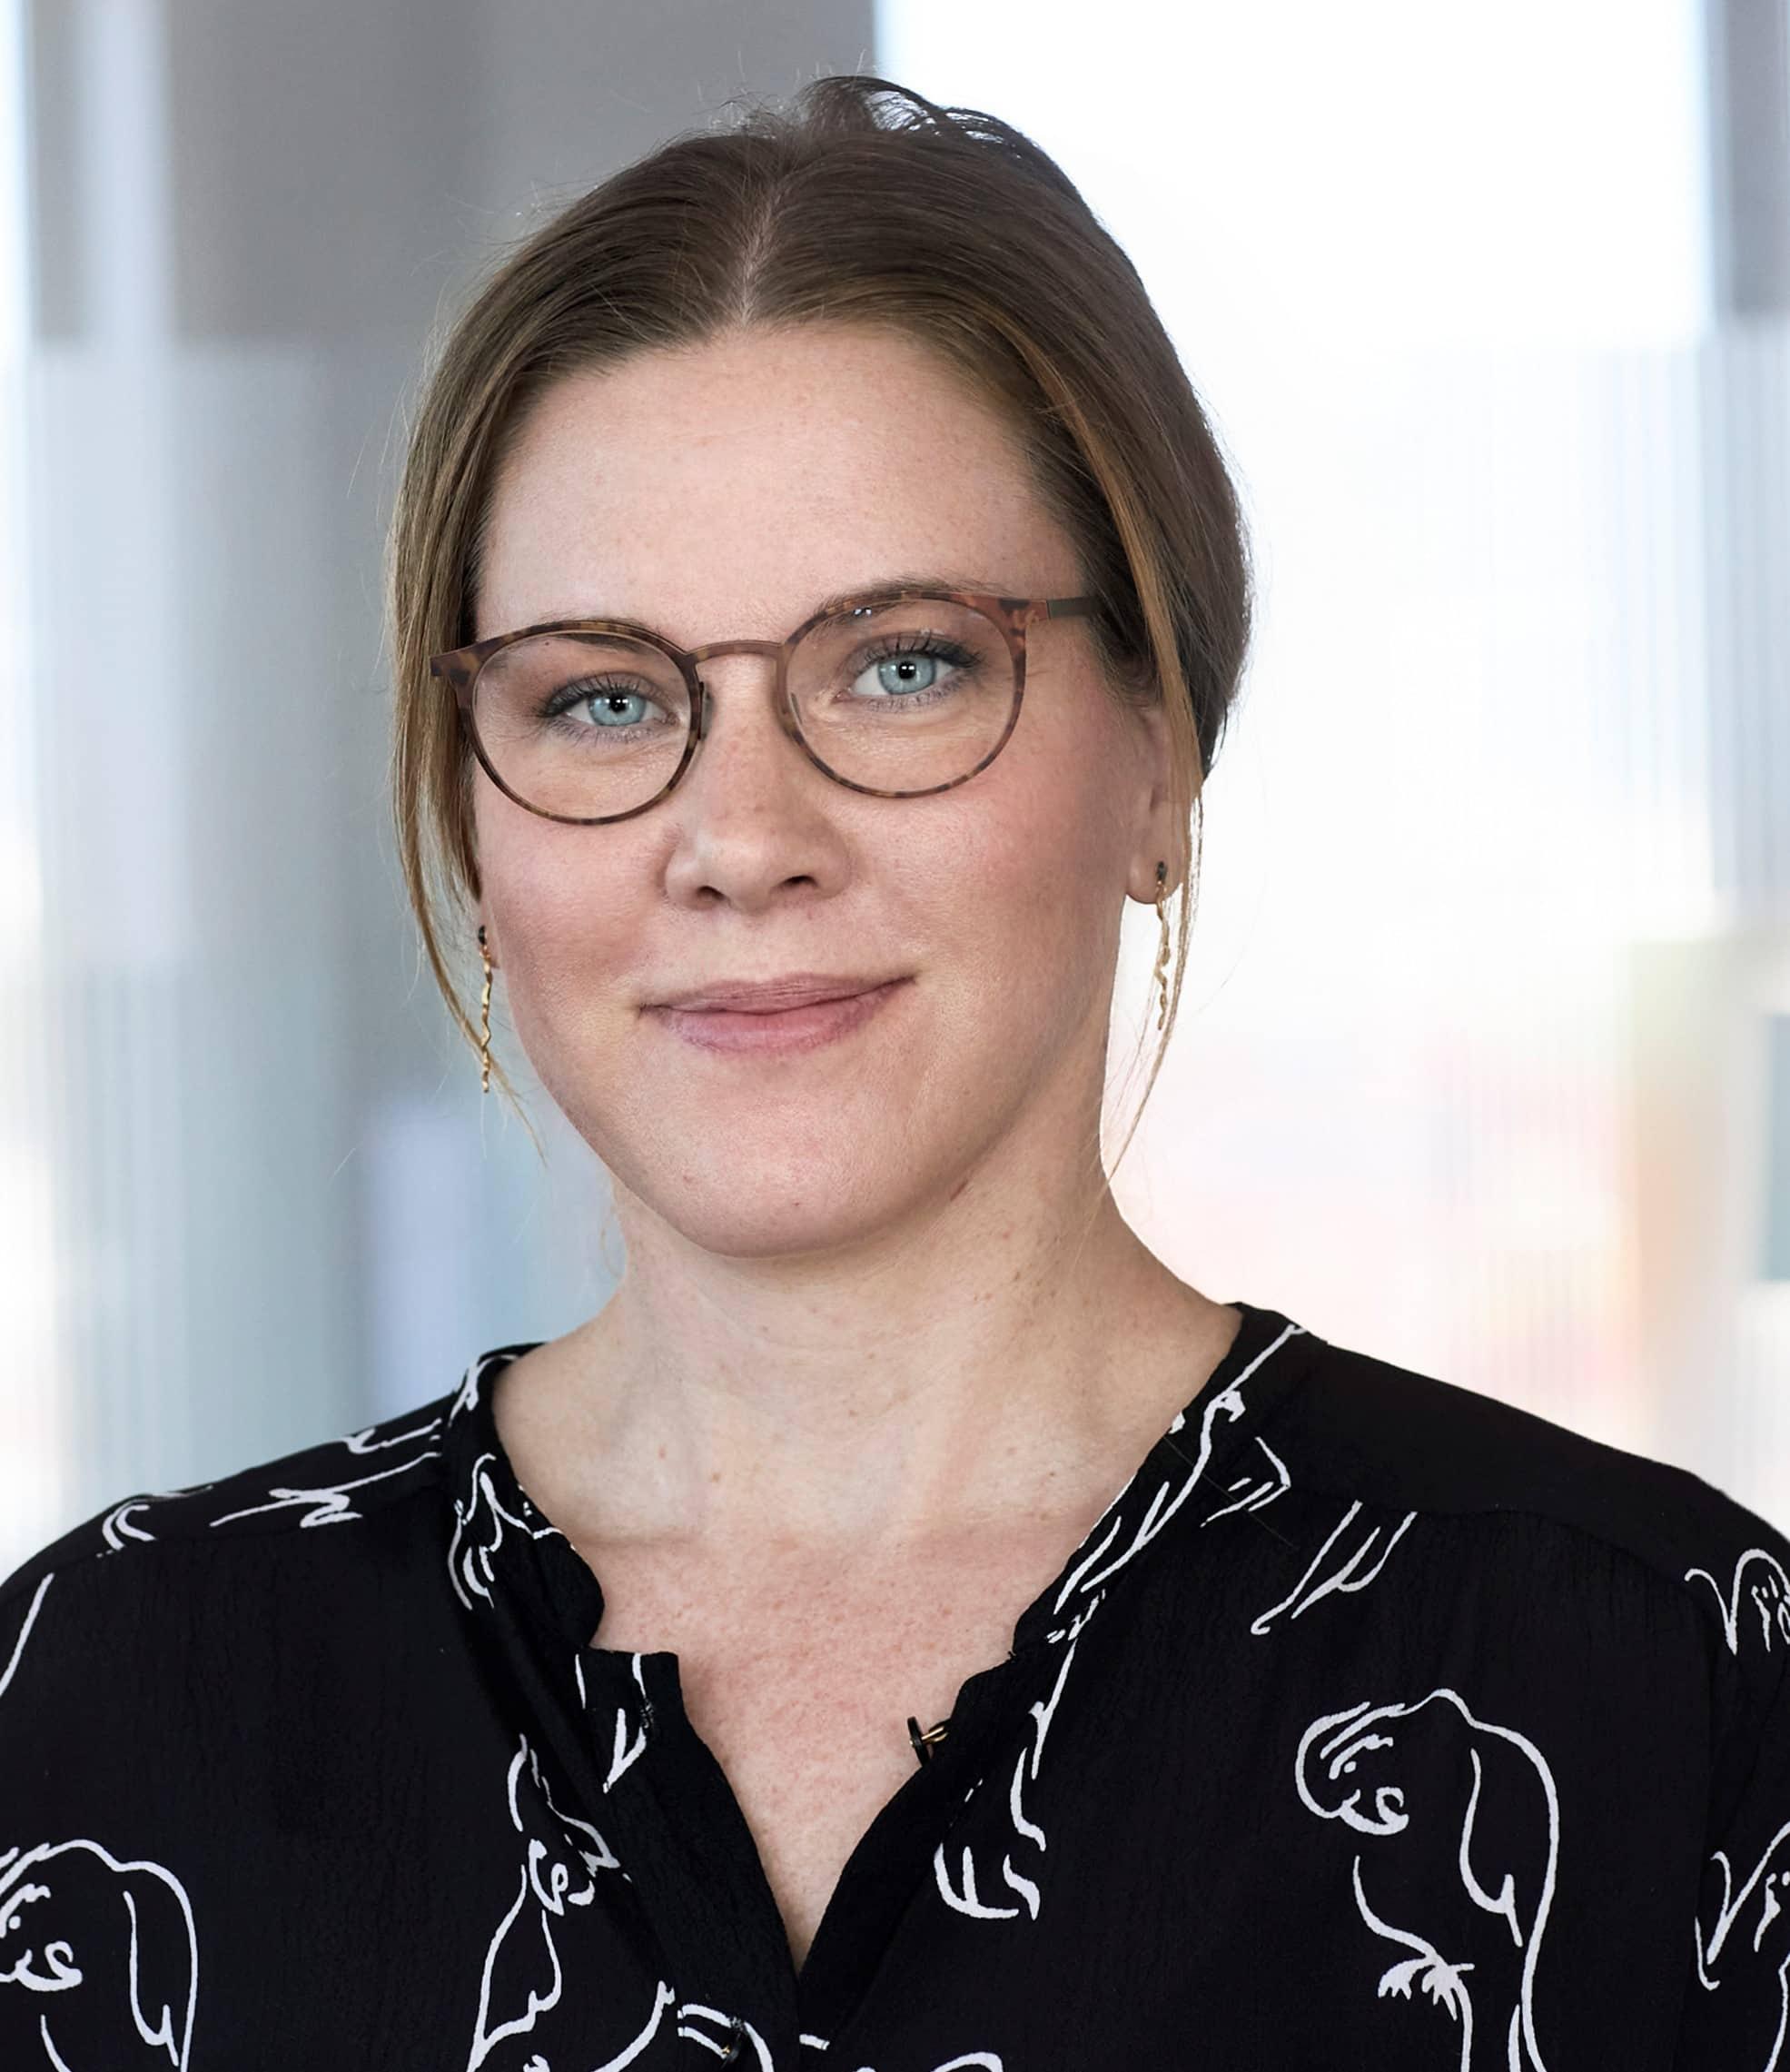 Henriette Nørgaard